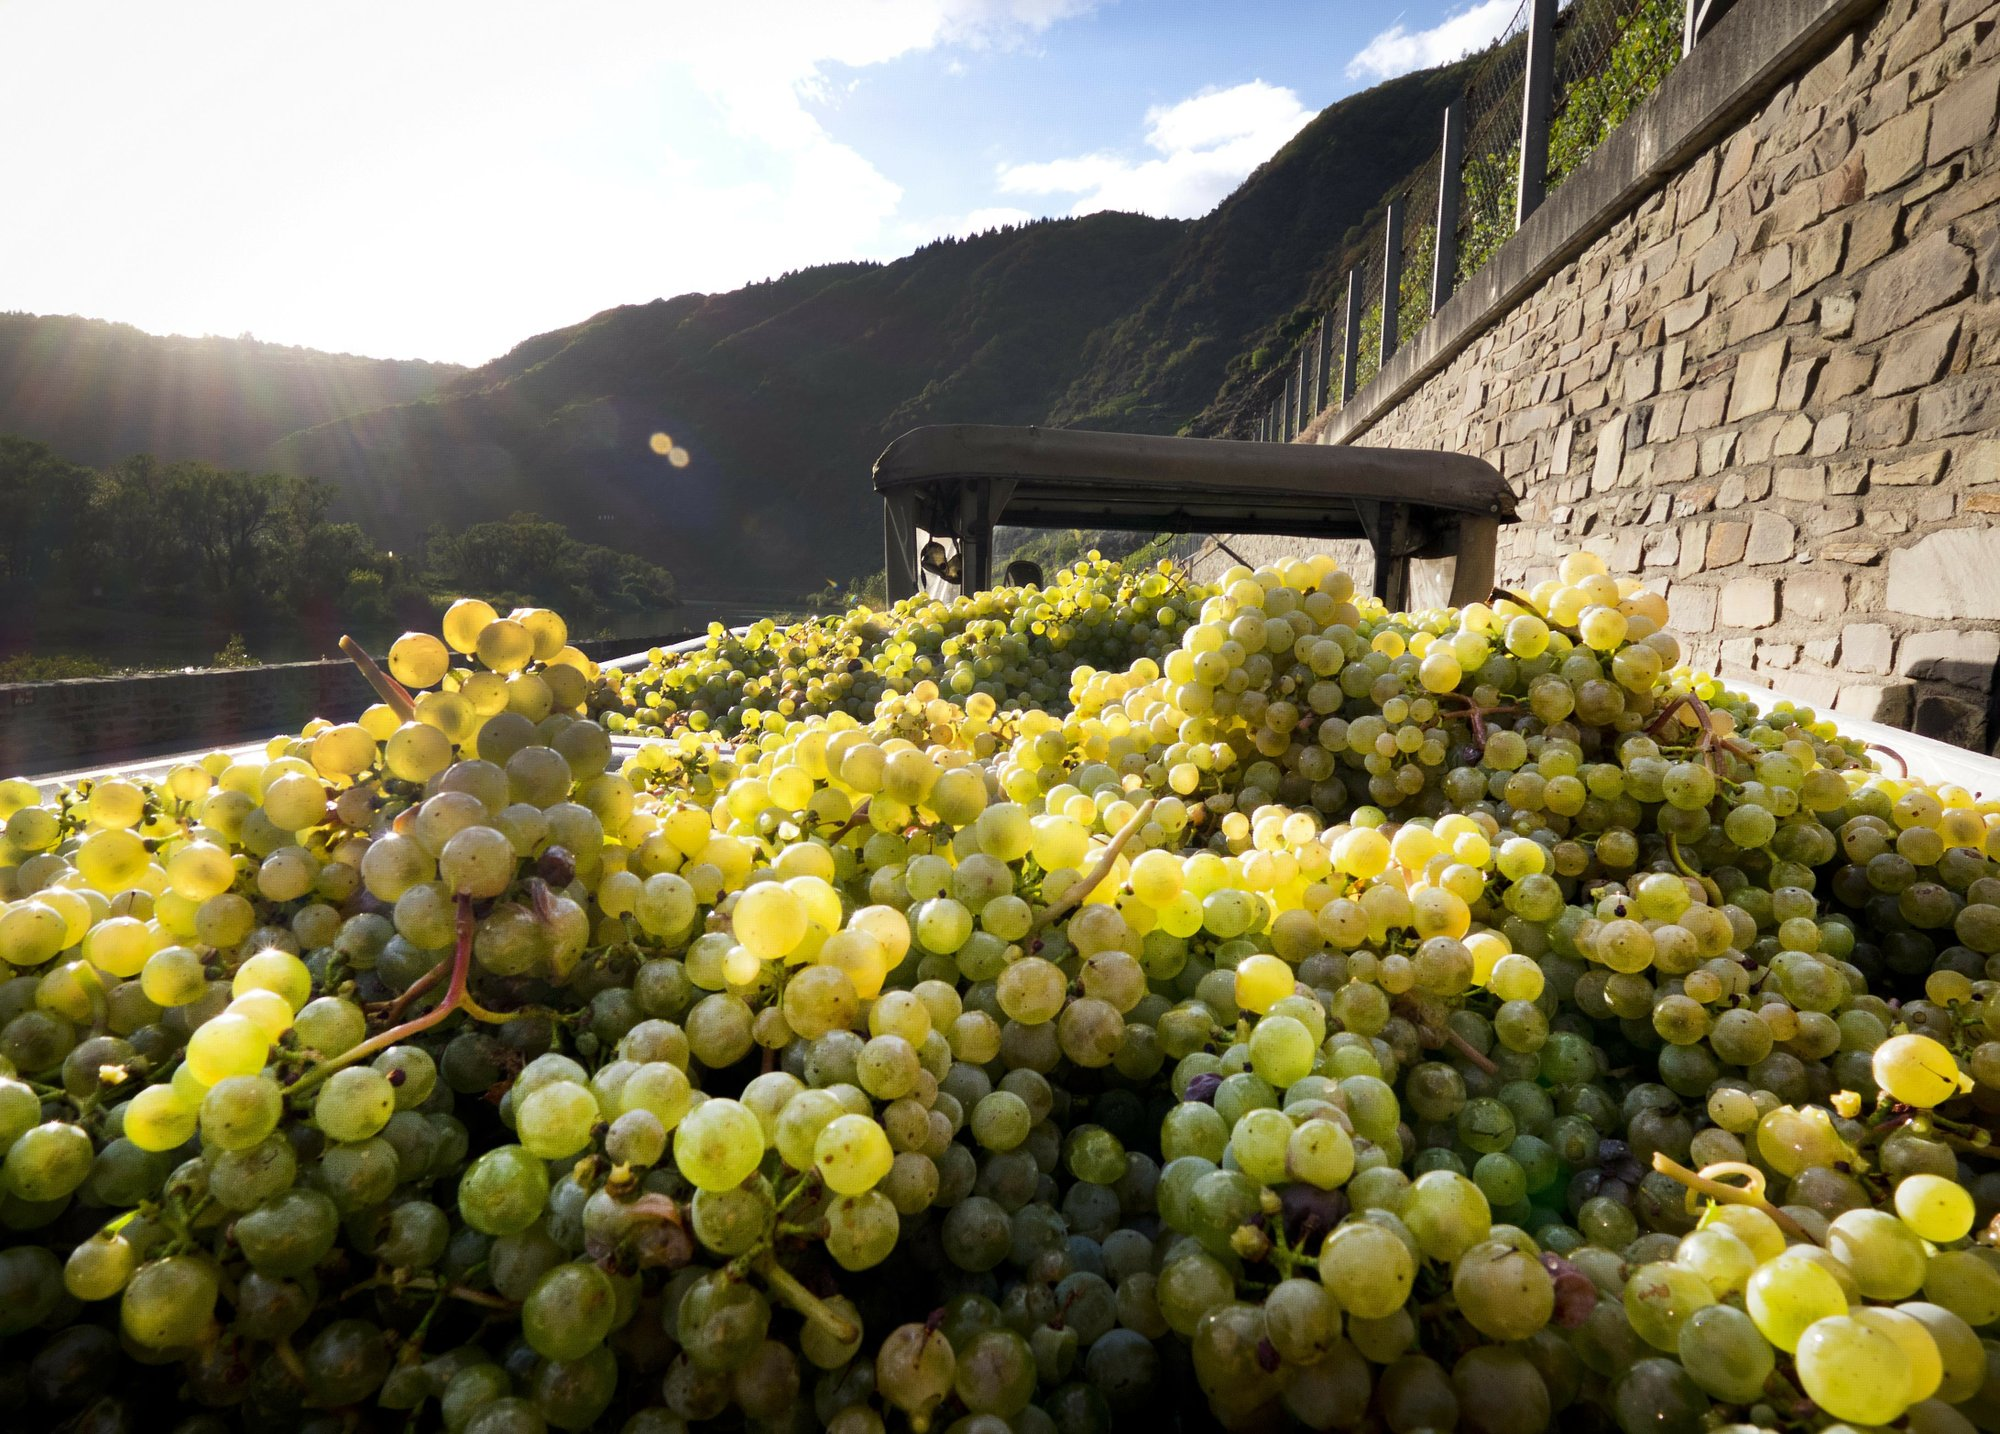 Germany sees biggest wine harvest since '99 after hot summer